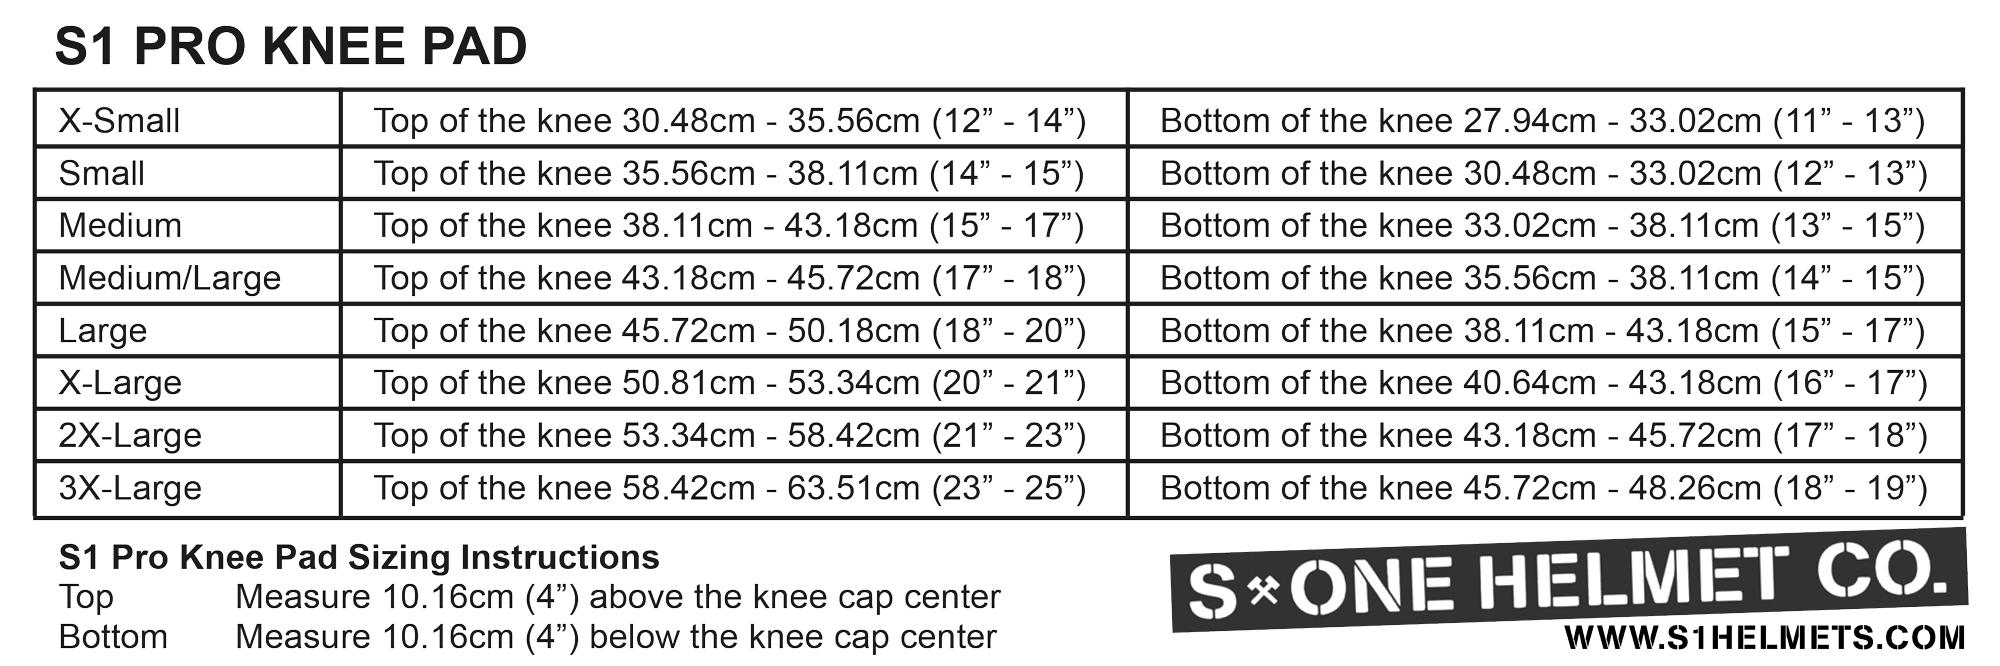 proknee-sizing-chart-com.jpg